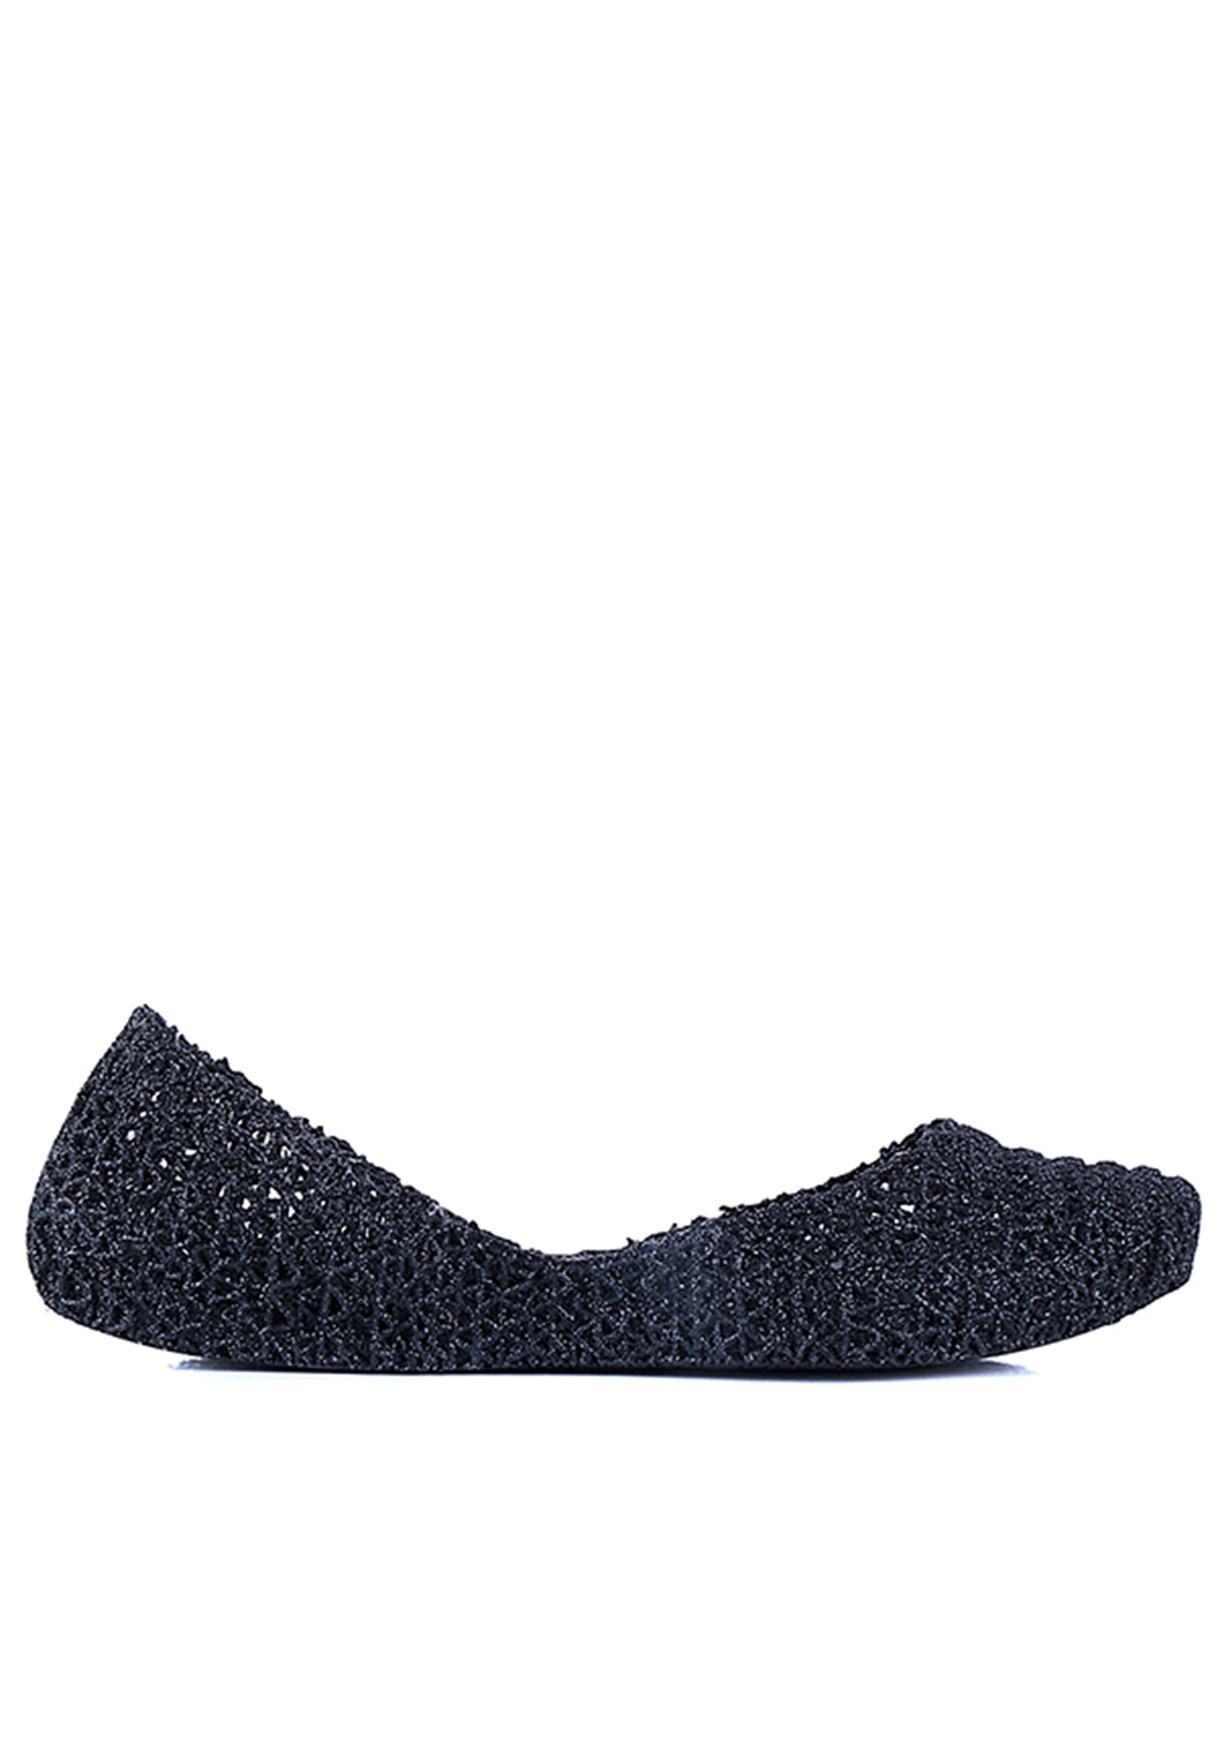 Campana Paple Women's Flat Shoes